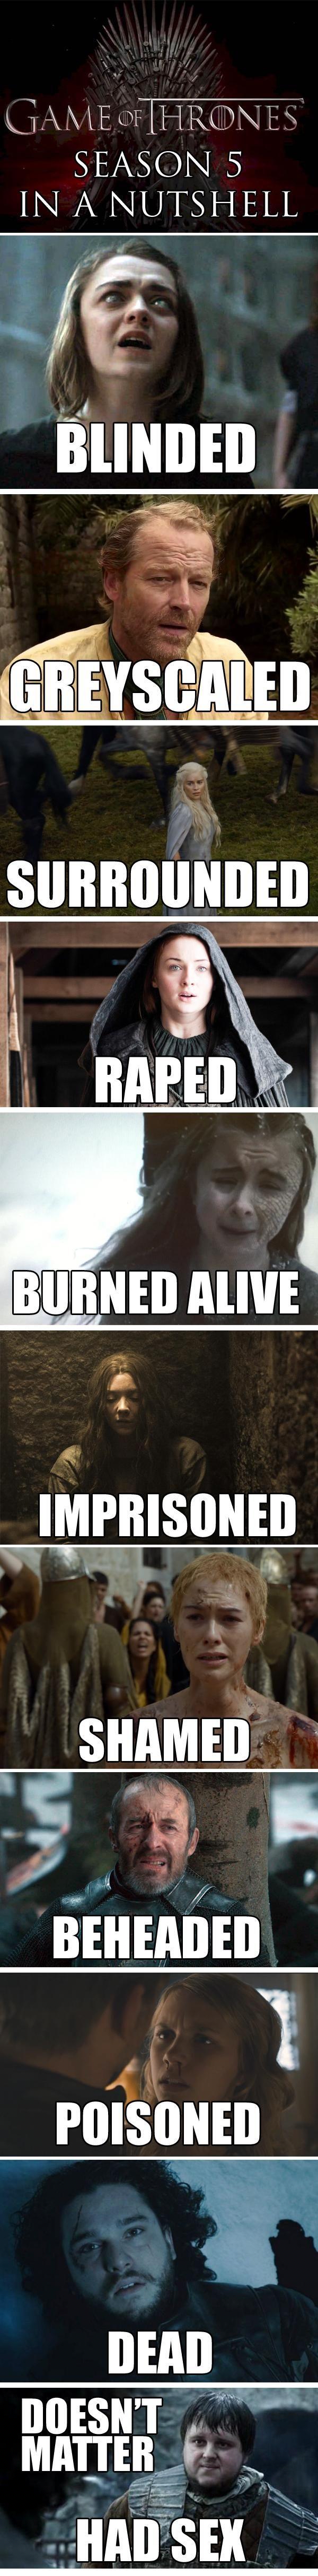 Game of Thrones Season 5 in a Nutshell - Imgur